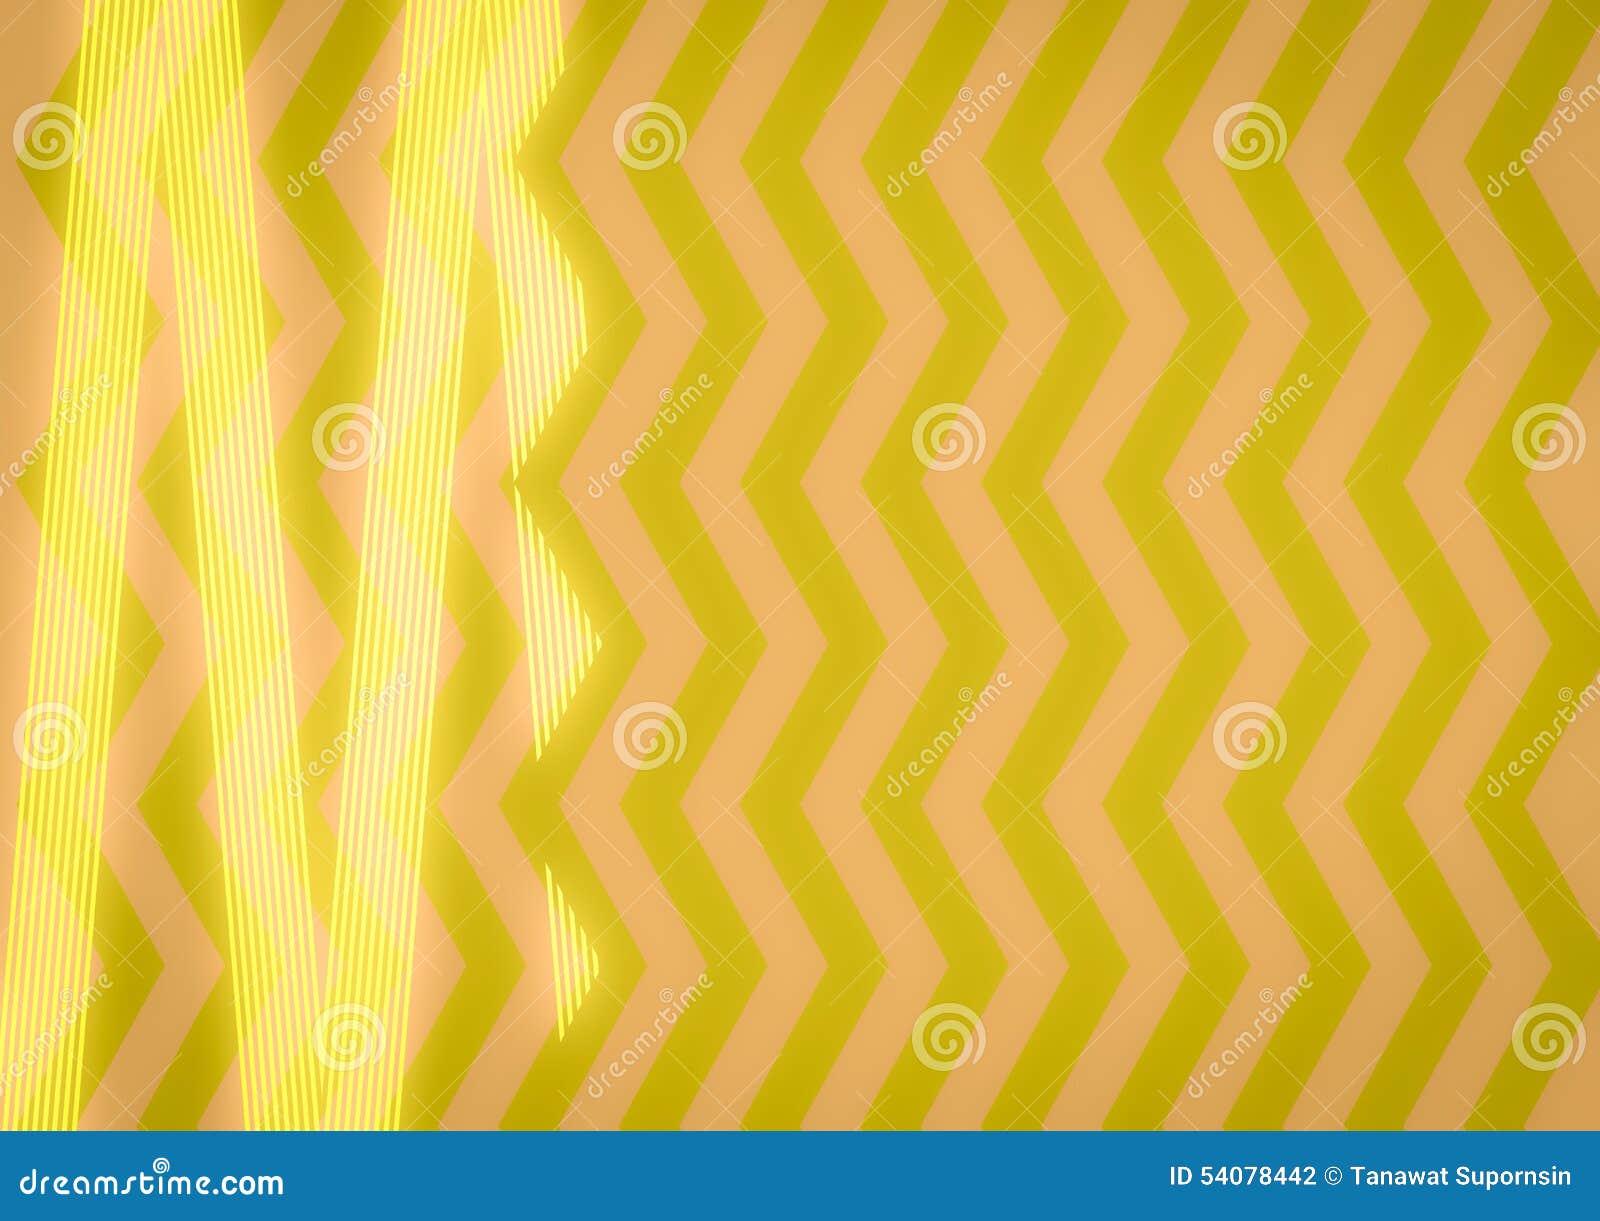 Abstract Geel Zigzagpatroon